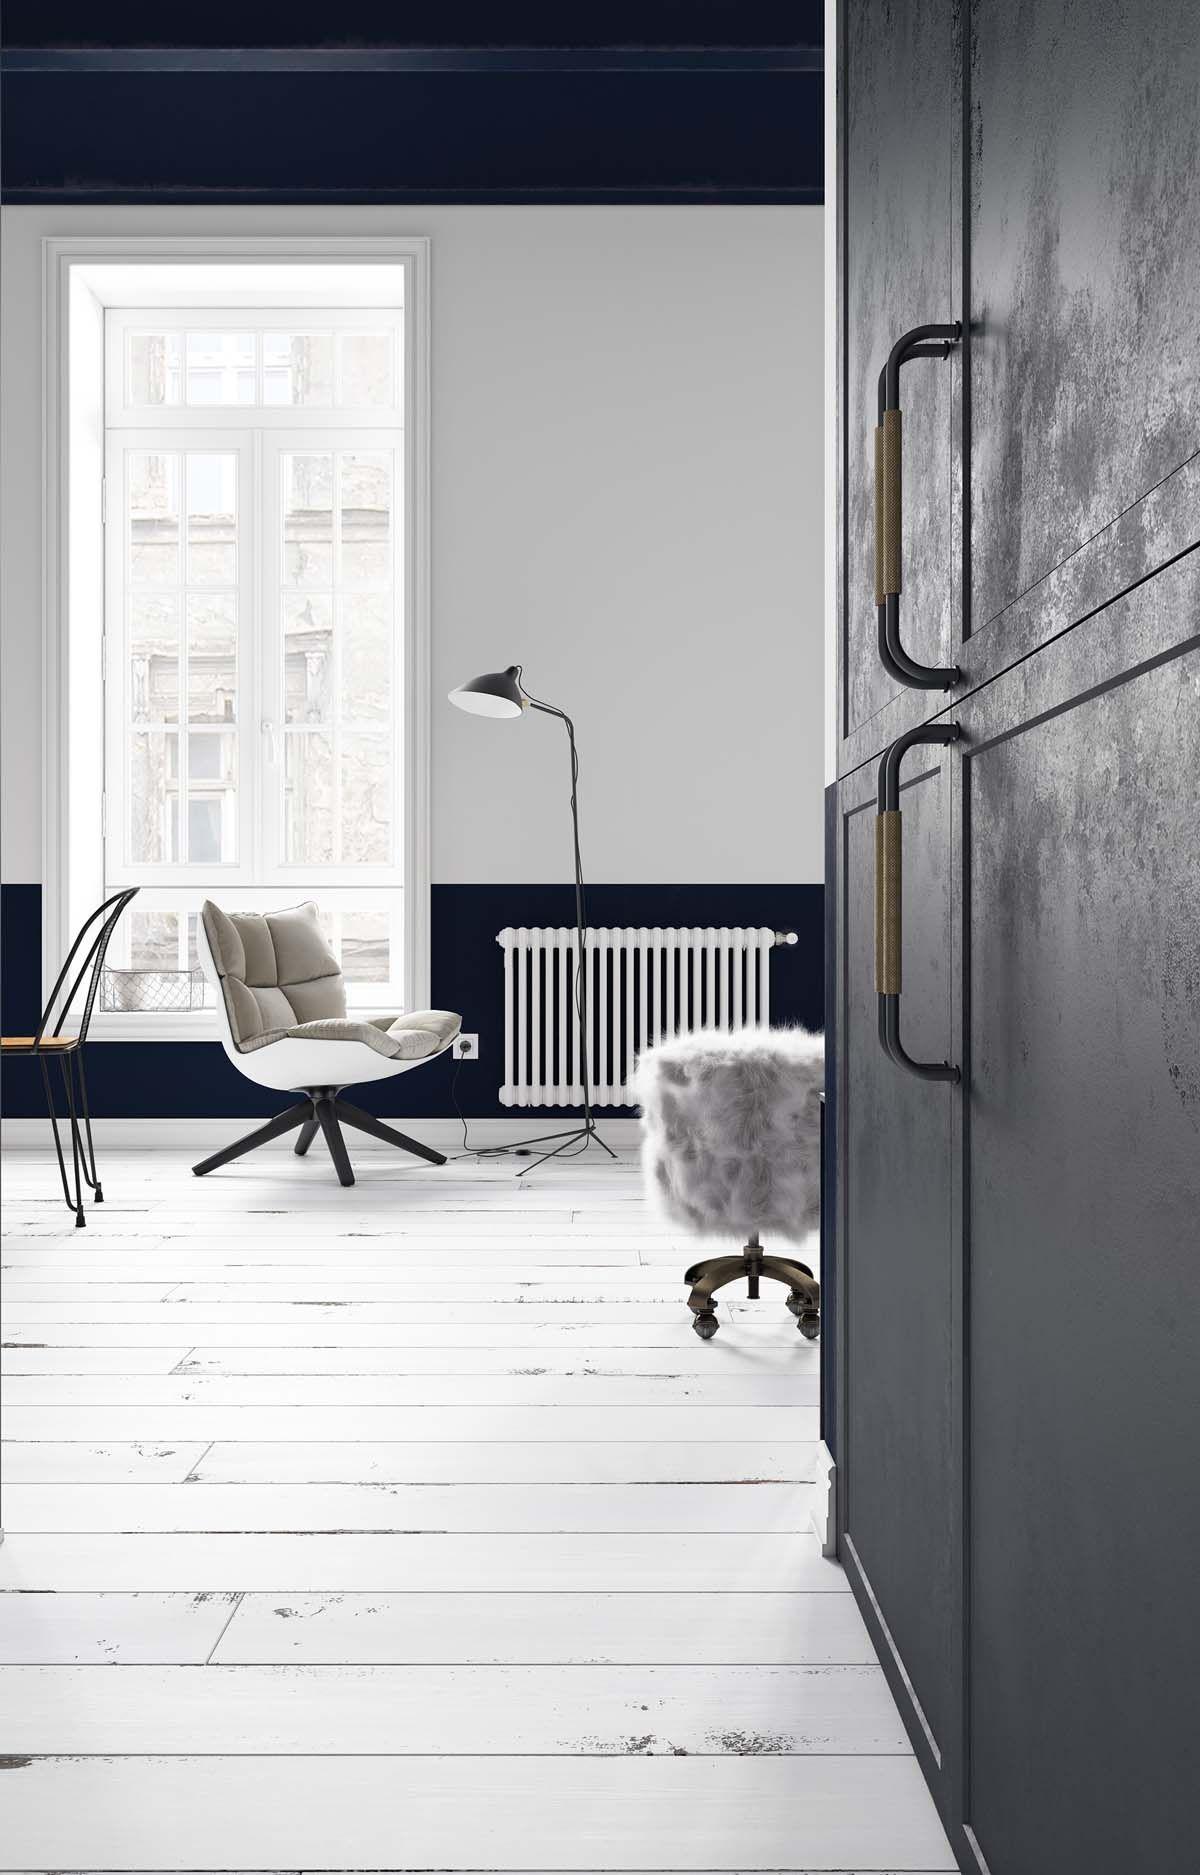 Inspiration to create a contemporary Scandinavian style